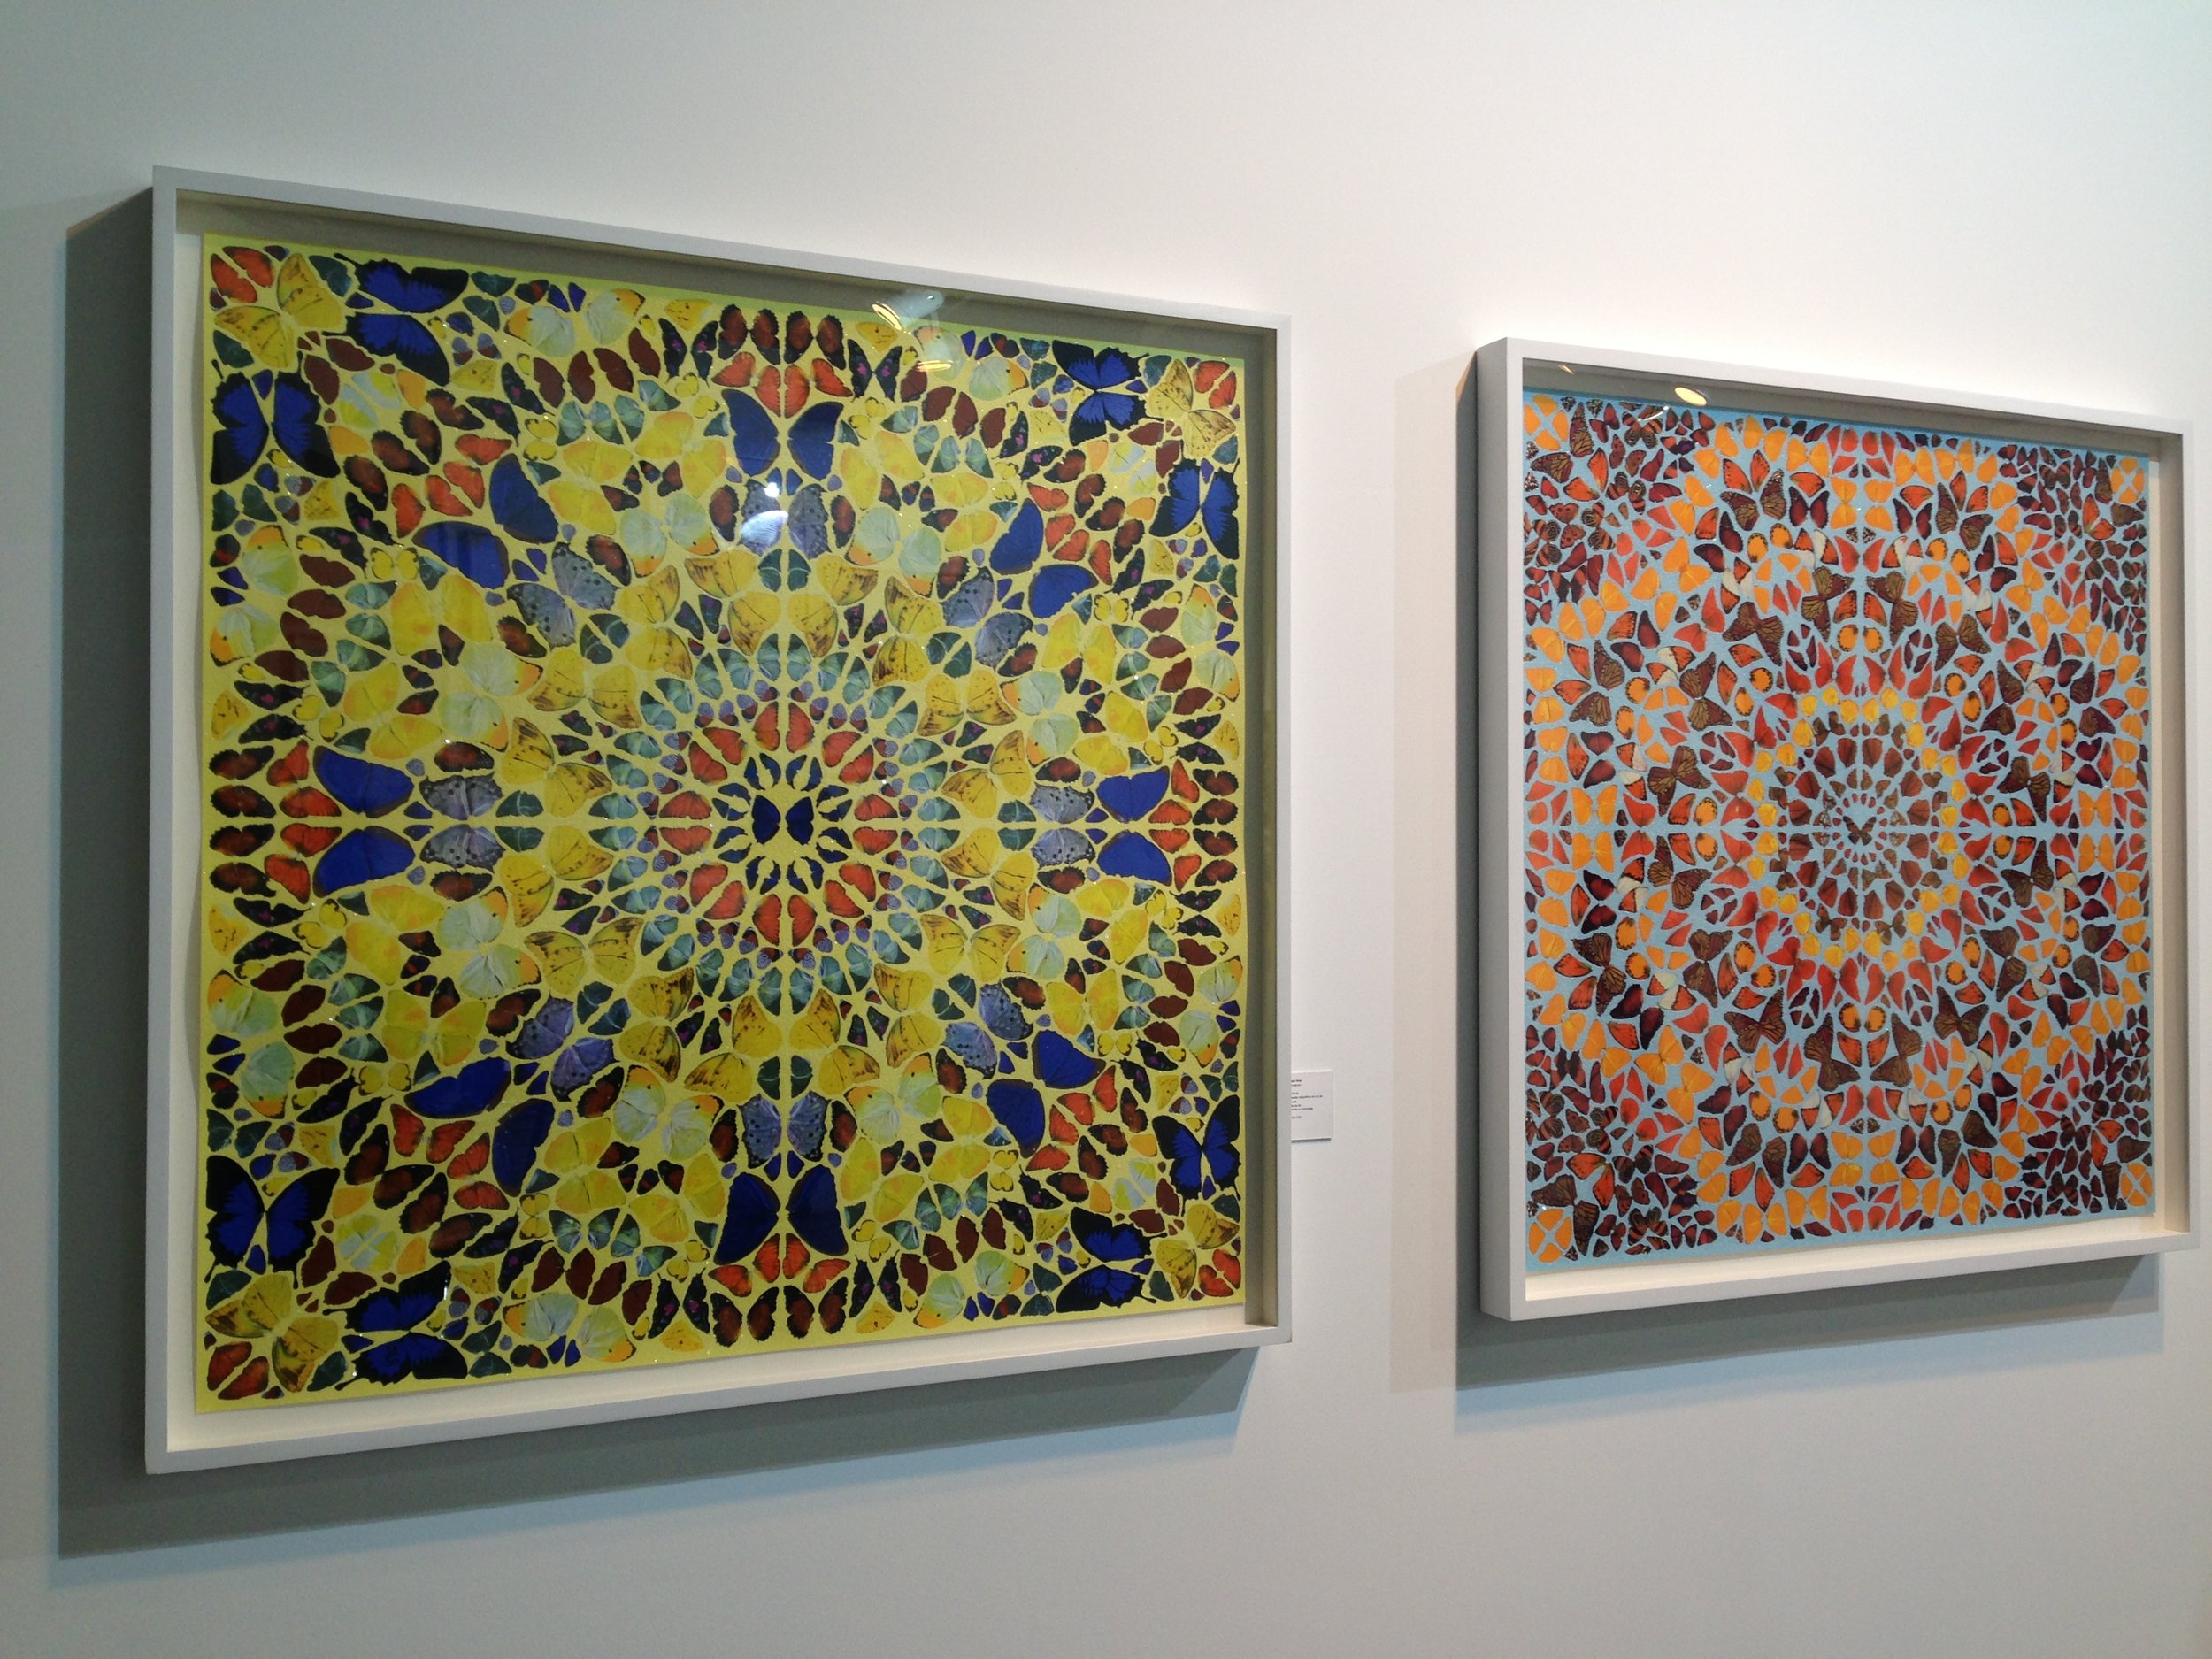 Obras da série 'Kaleidoscope'